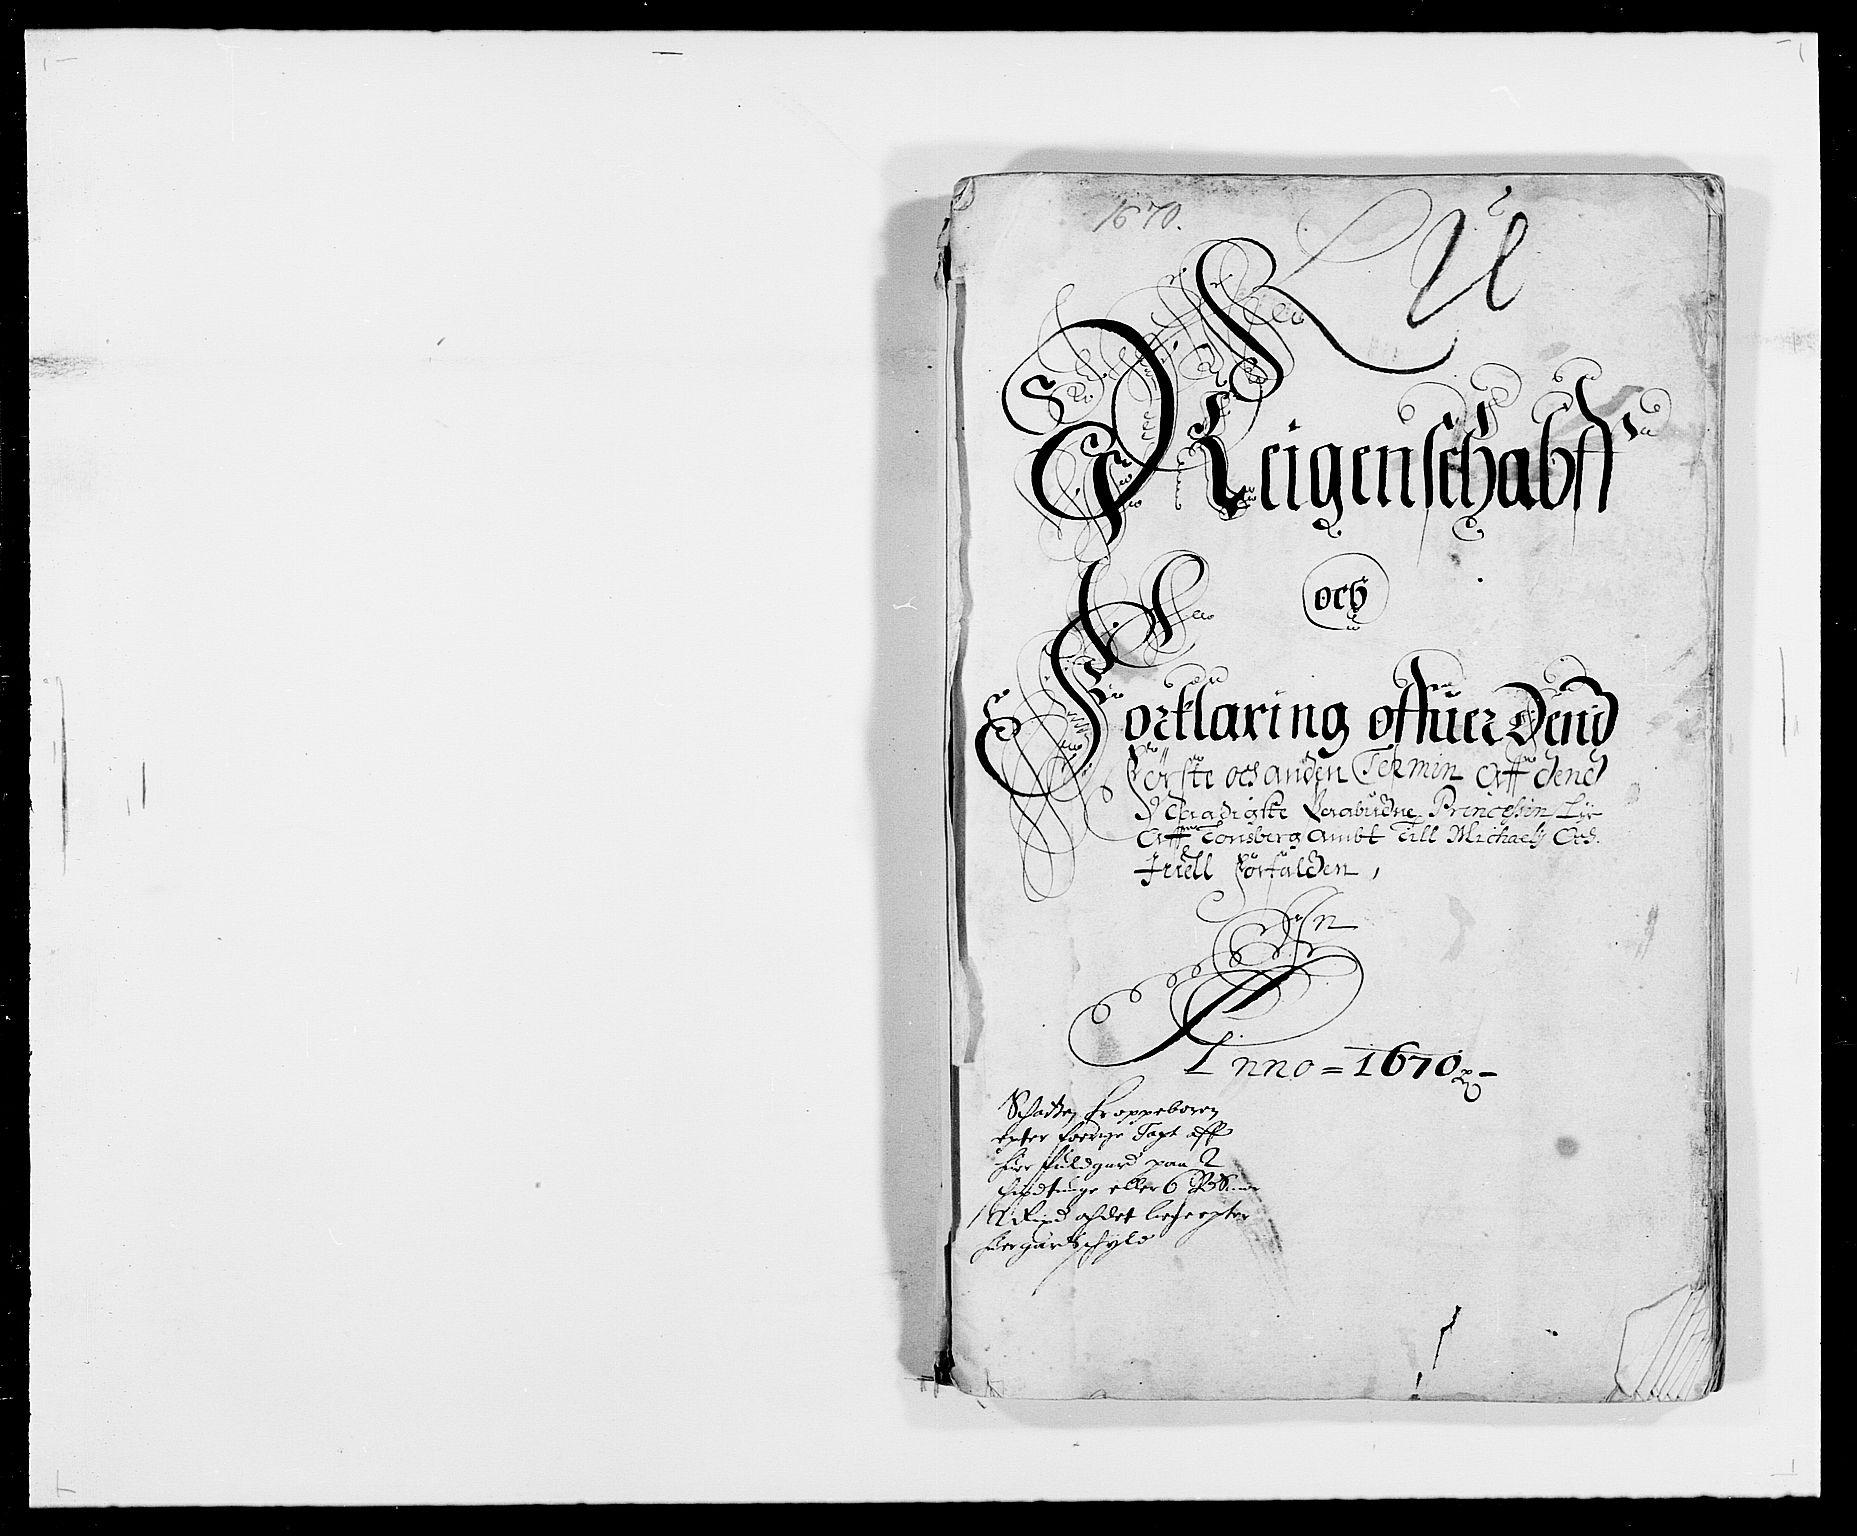 RA, Rentekammeret inntil 1814, Reviderte regnskaper, Fogderegnskap, R32/L1841: Fogderegnskap Jarlsberg grevskap, 1664-1673, s. 71